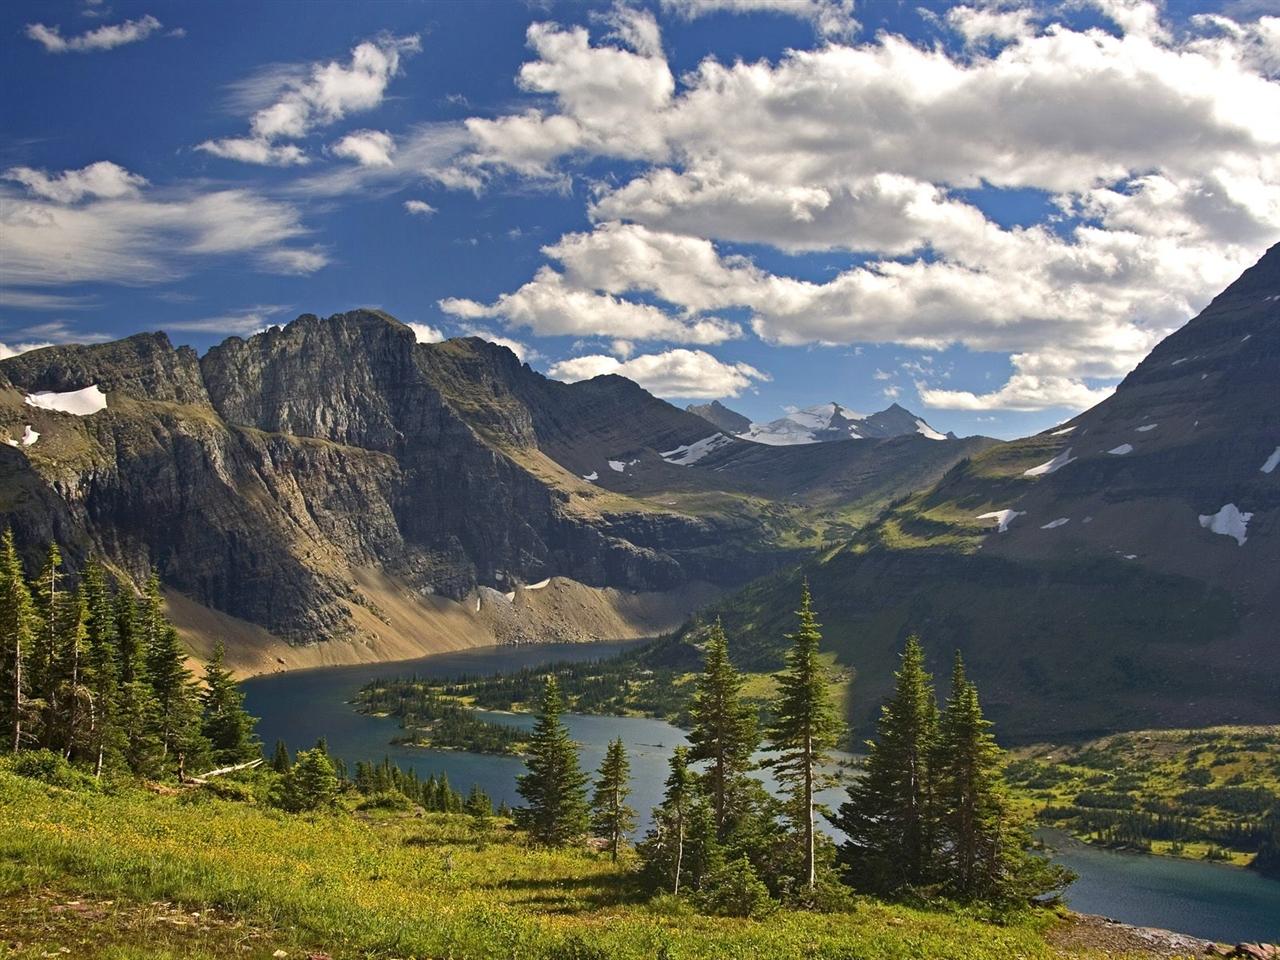 montana Montana United States of America